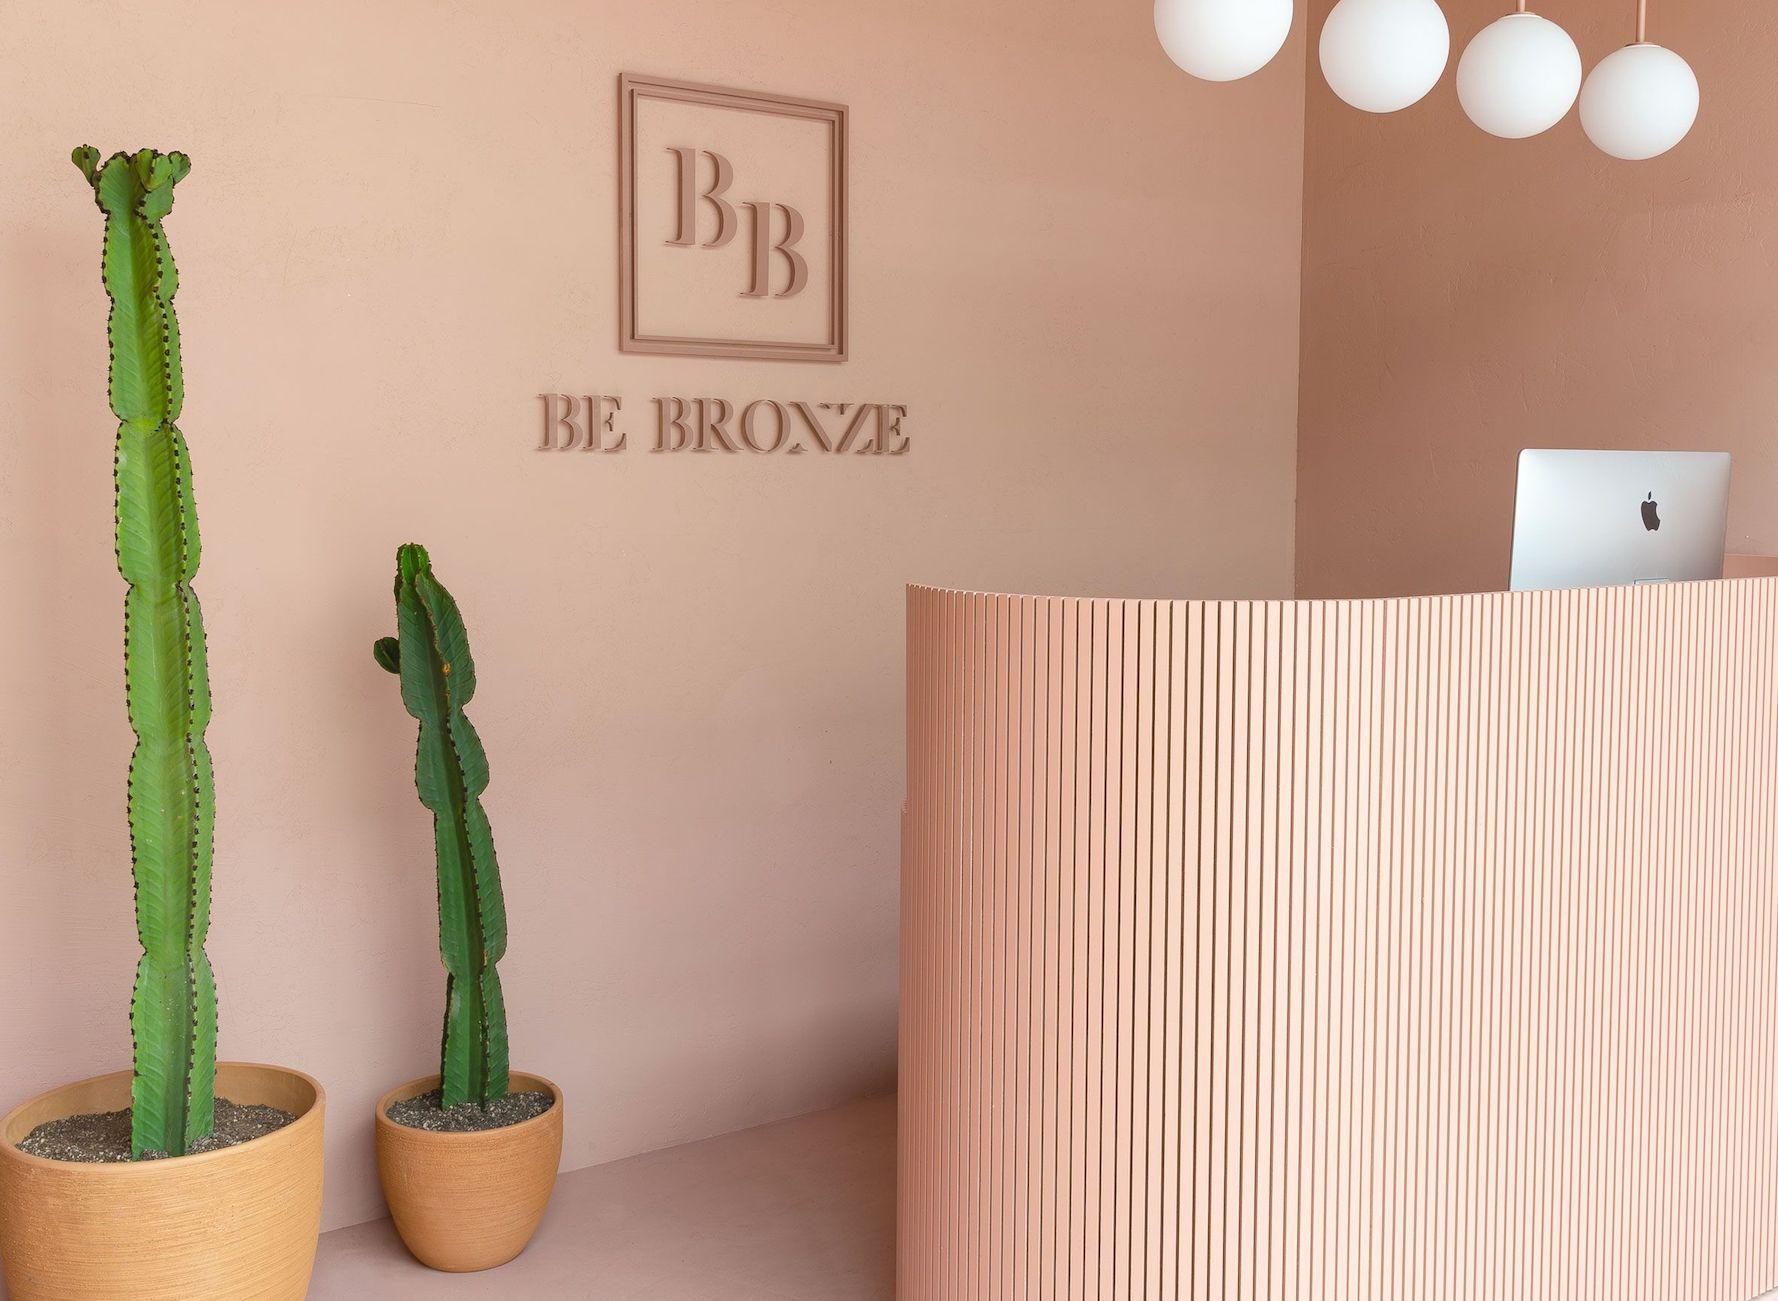 West Hollywood Be Bronze Studio lobby